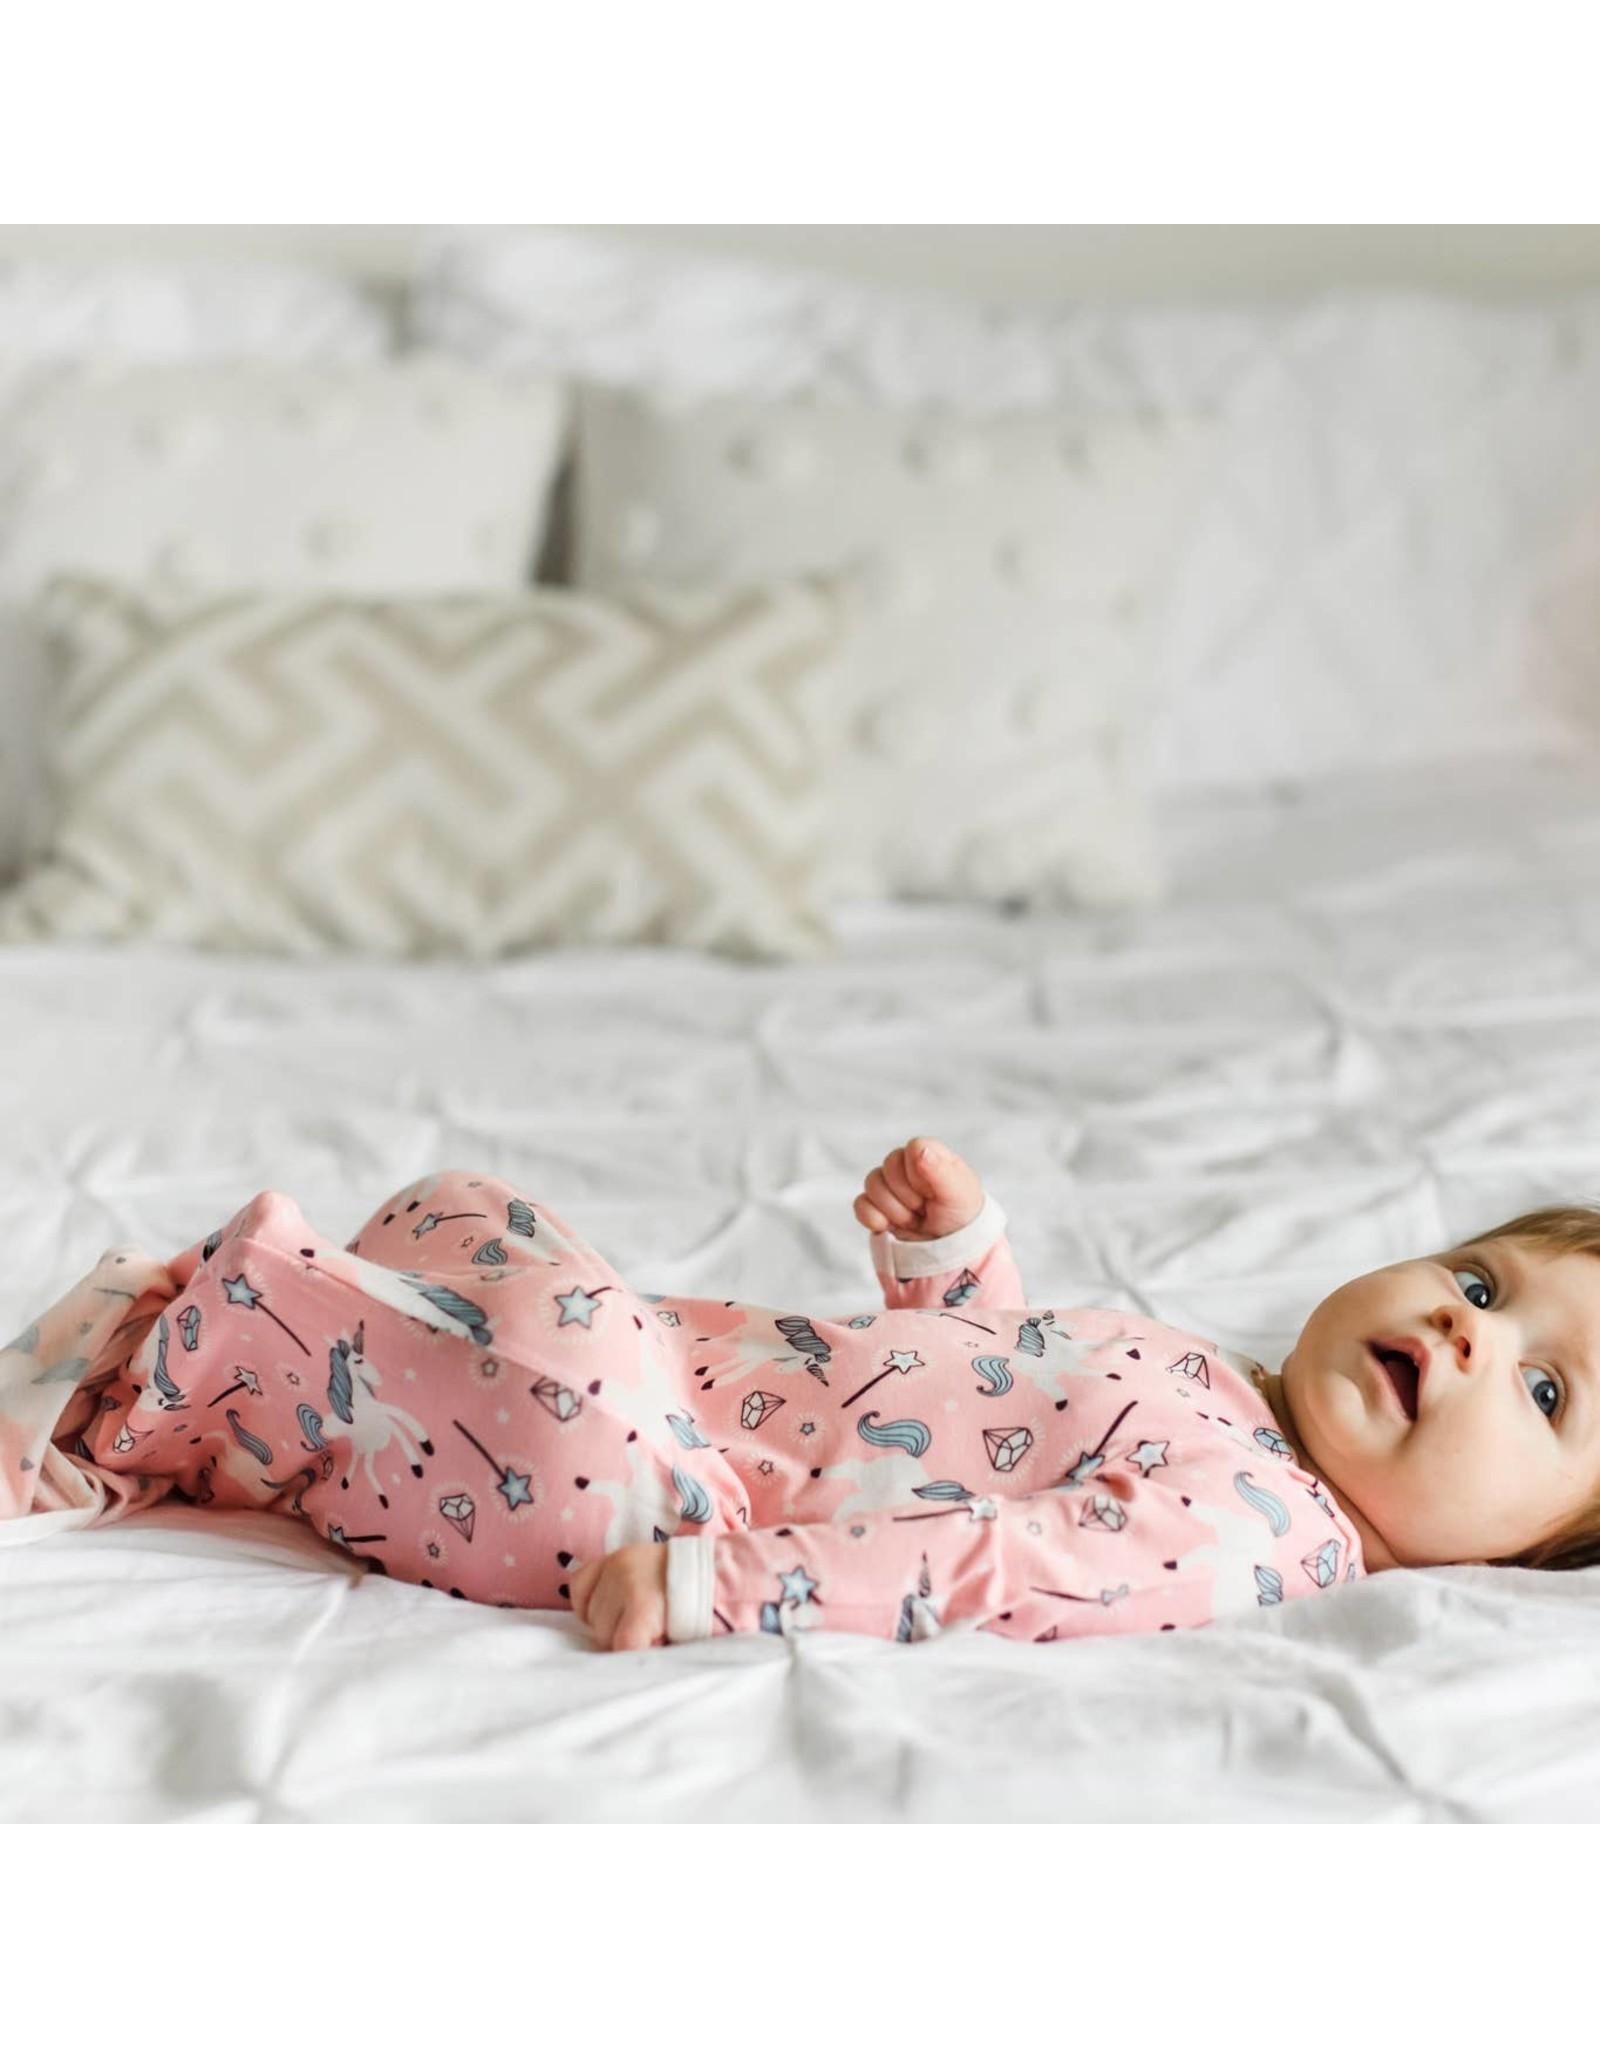 Little Sleepies Little Sleepies- Unicorns  Bamboo Knotted Gown NB-3M